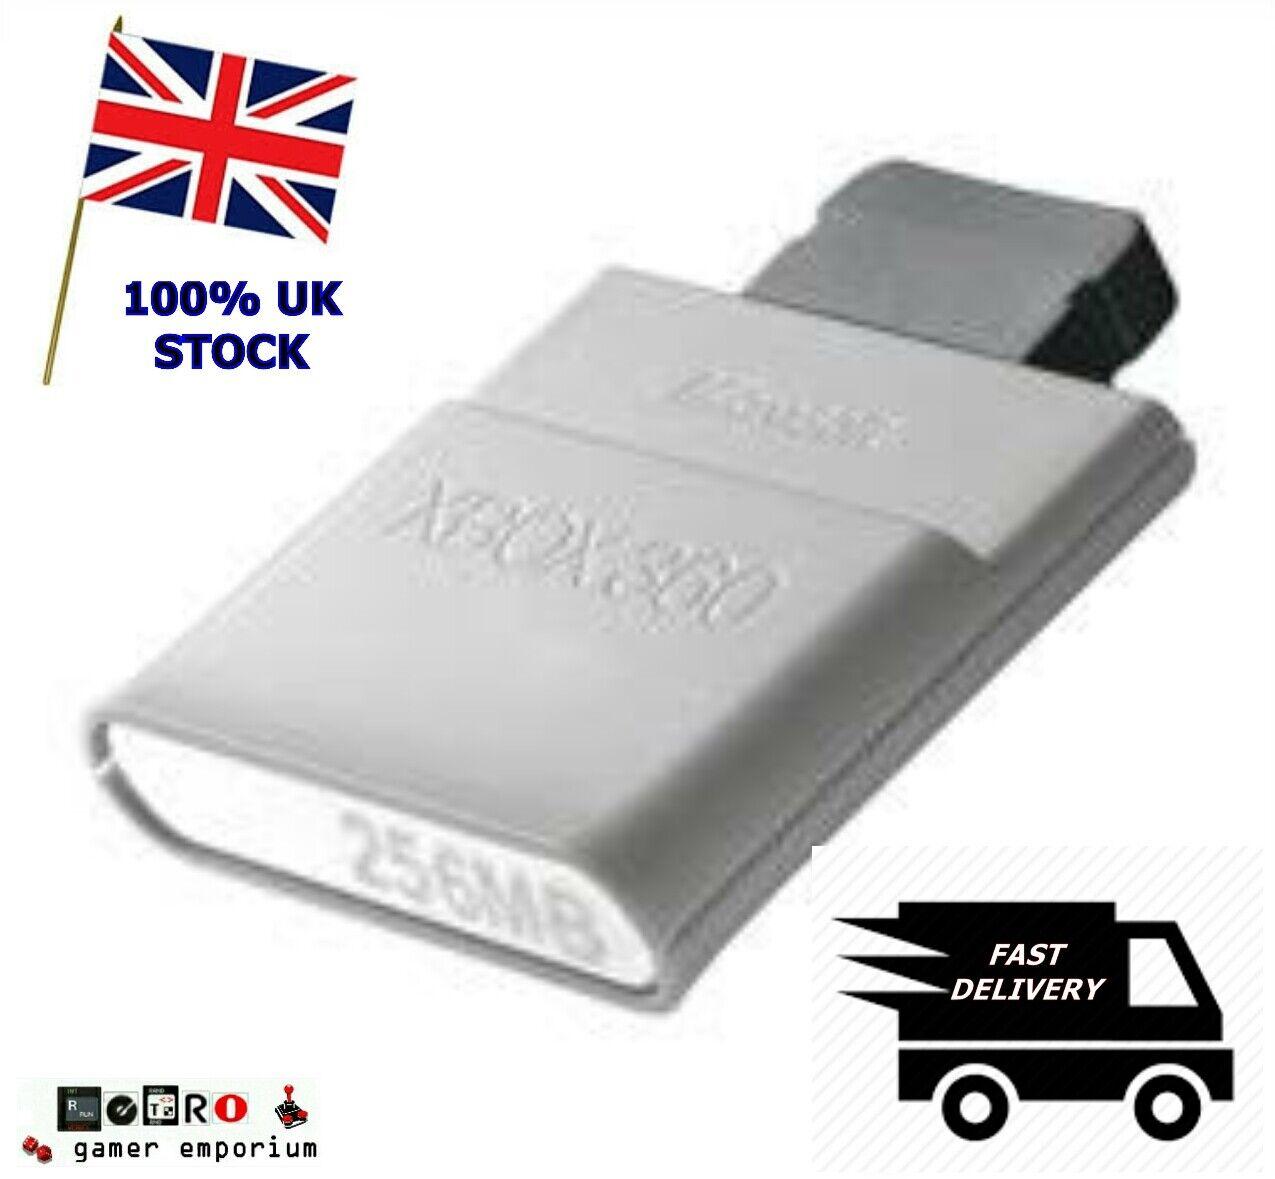 GENUINE OFFICIAL MICROSOFT XBOX 360 256MB Meg Memory Card Unit x1